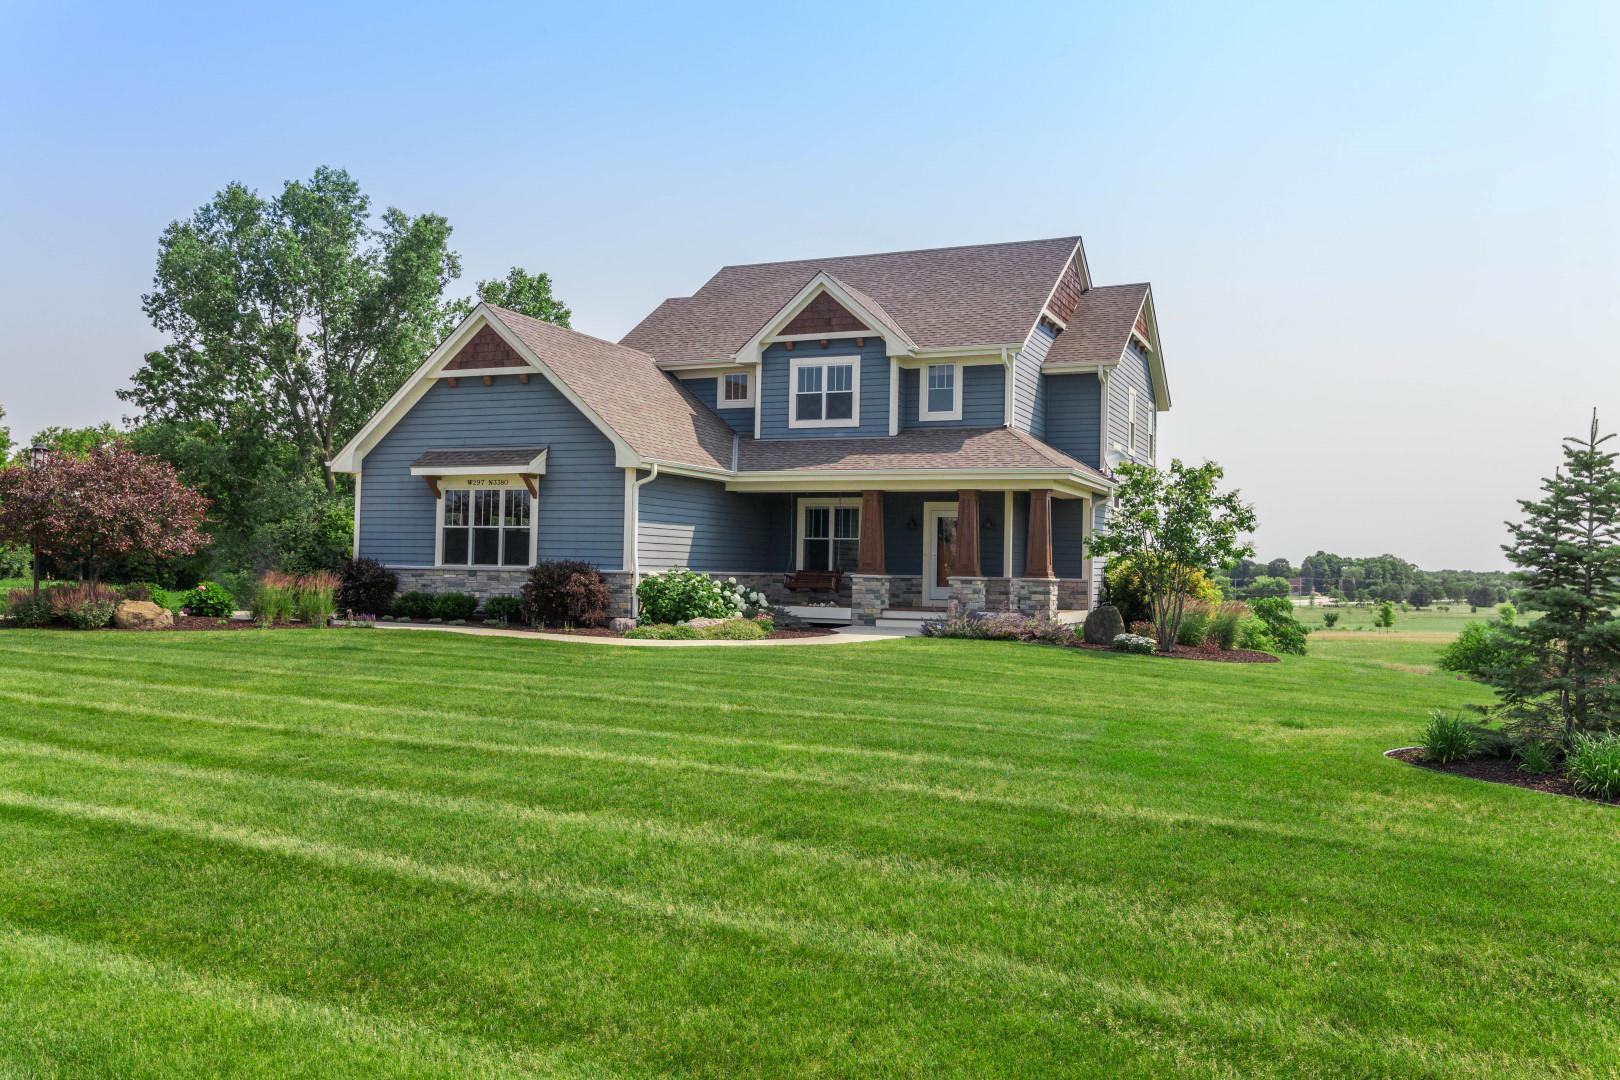 W297N3380 Woodridge Cir, Delafield, Wisconsin 53072, 5 Bedrooms Bedrooms, 11 Rooms Rooms,3 BathroomsBathrooms,Single-Family,For Sale,Woodridge Cir,1751509